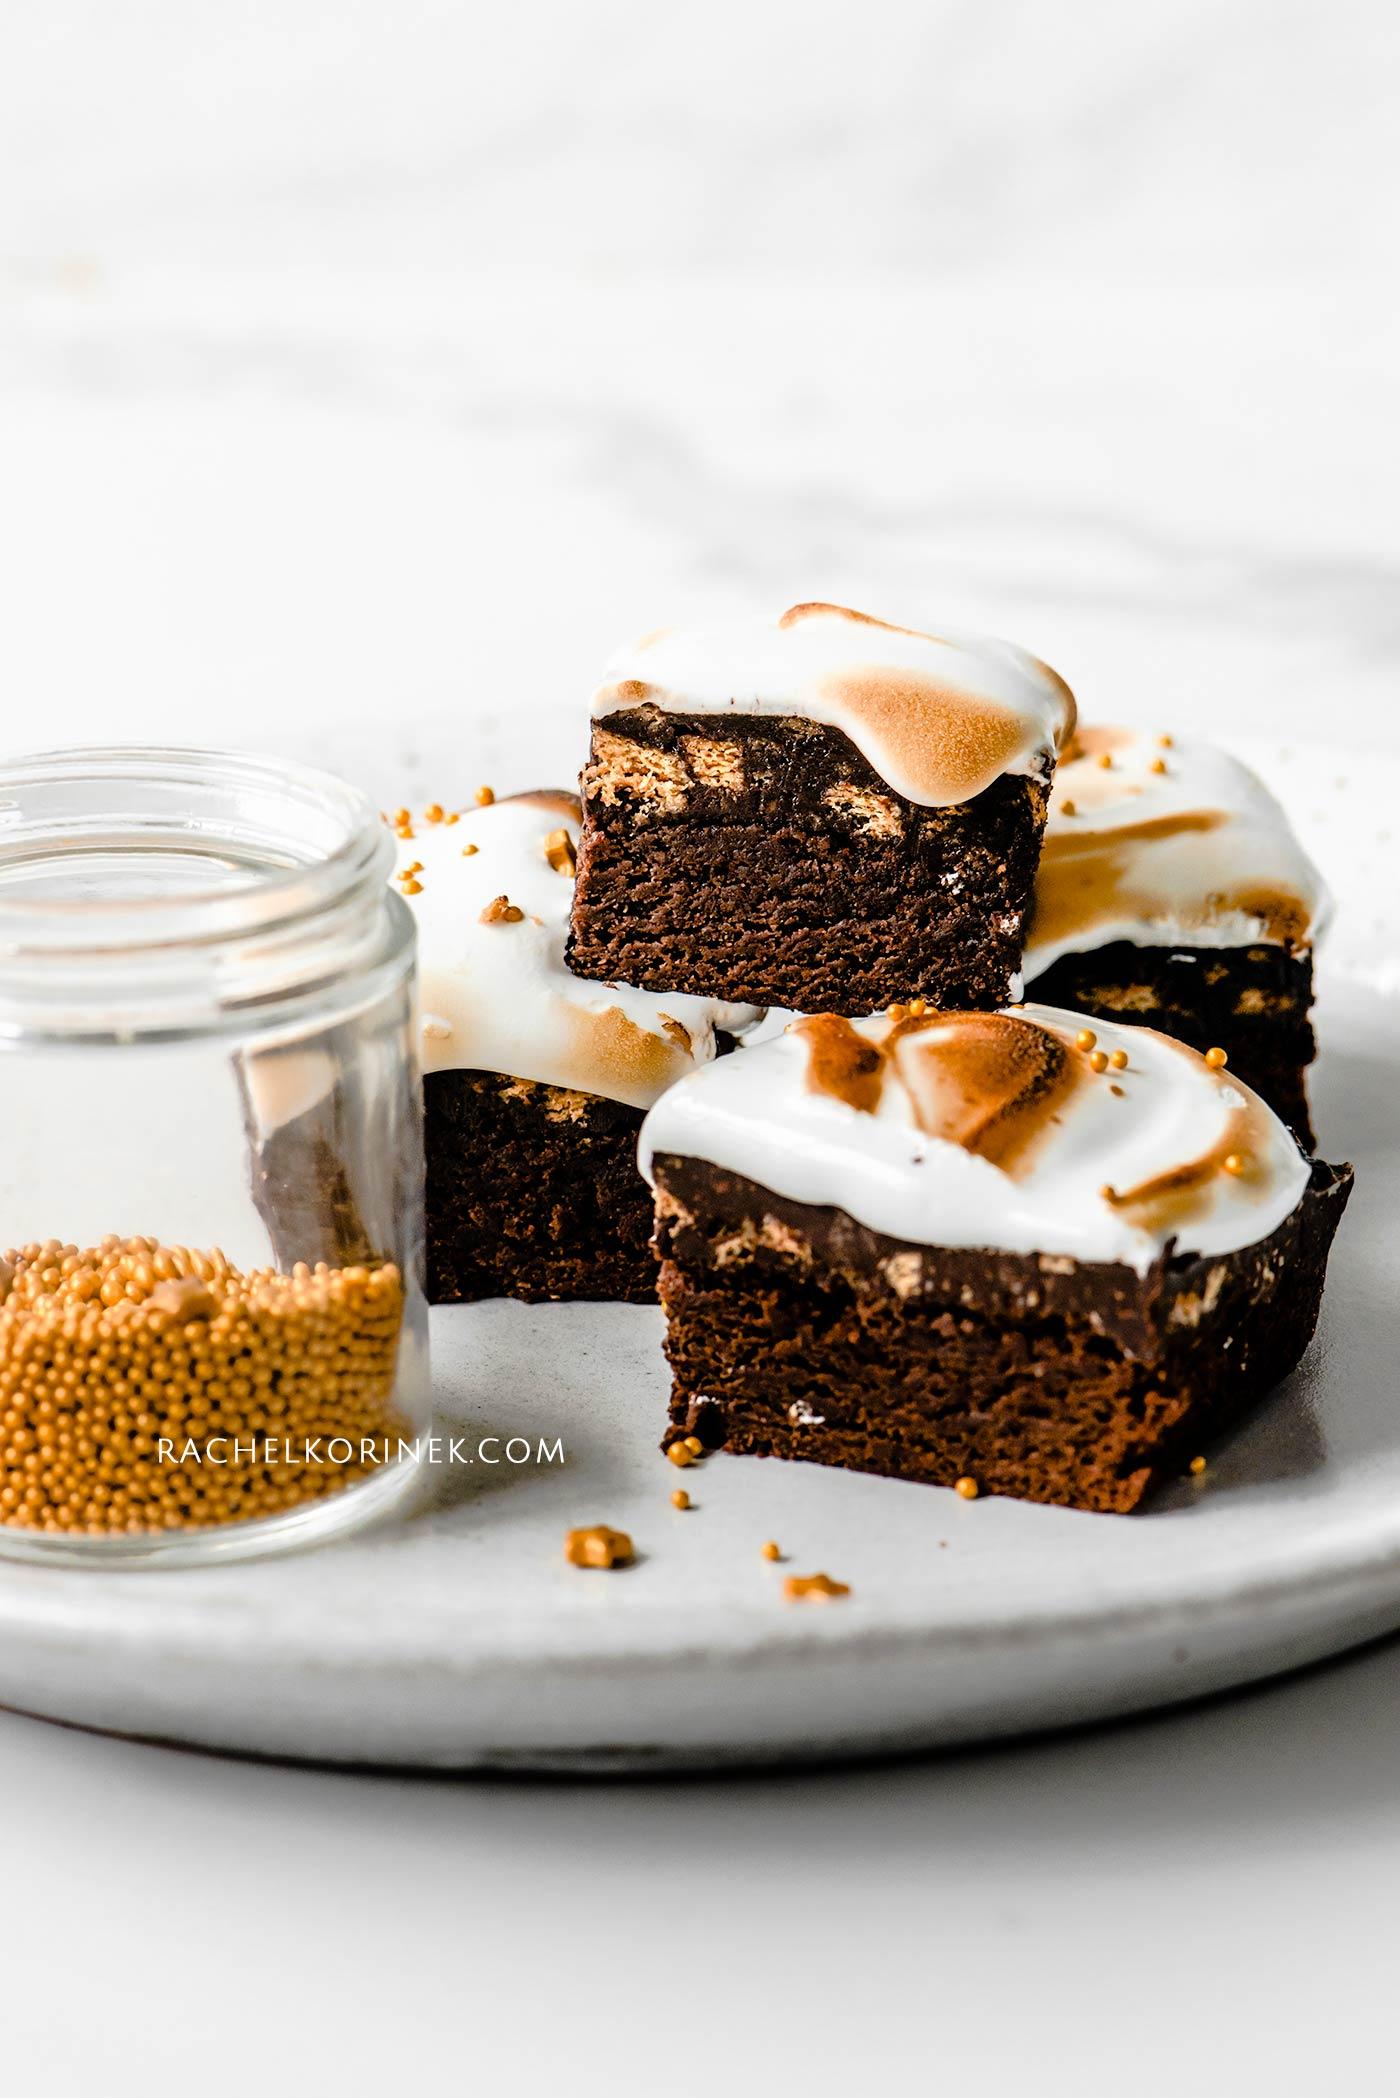 Rachel Korinek | Food Photographer Christmas S'mores Brownies